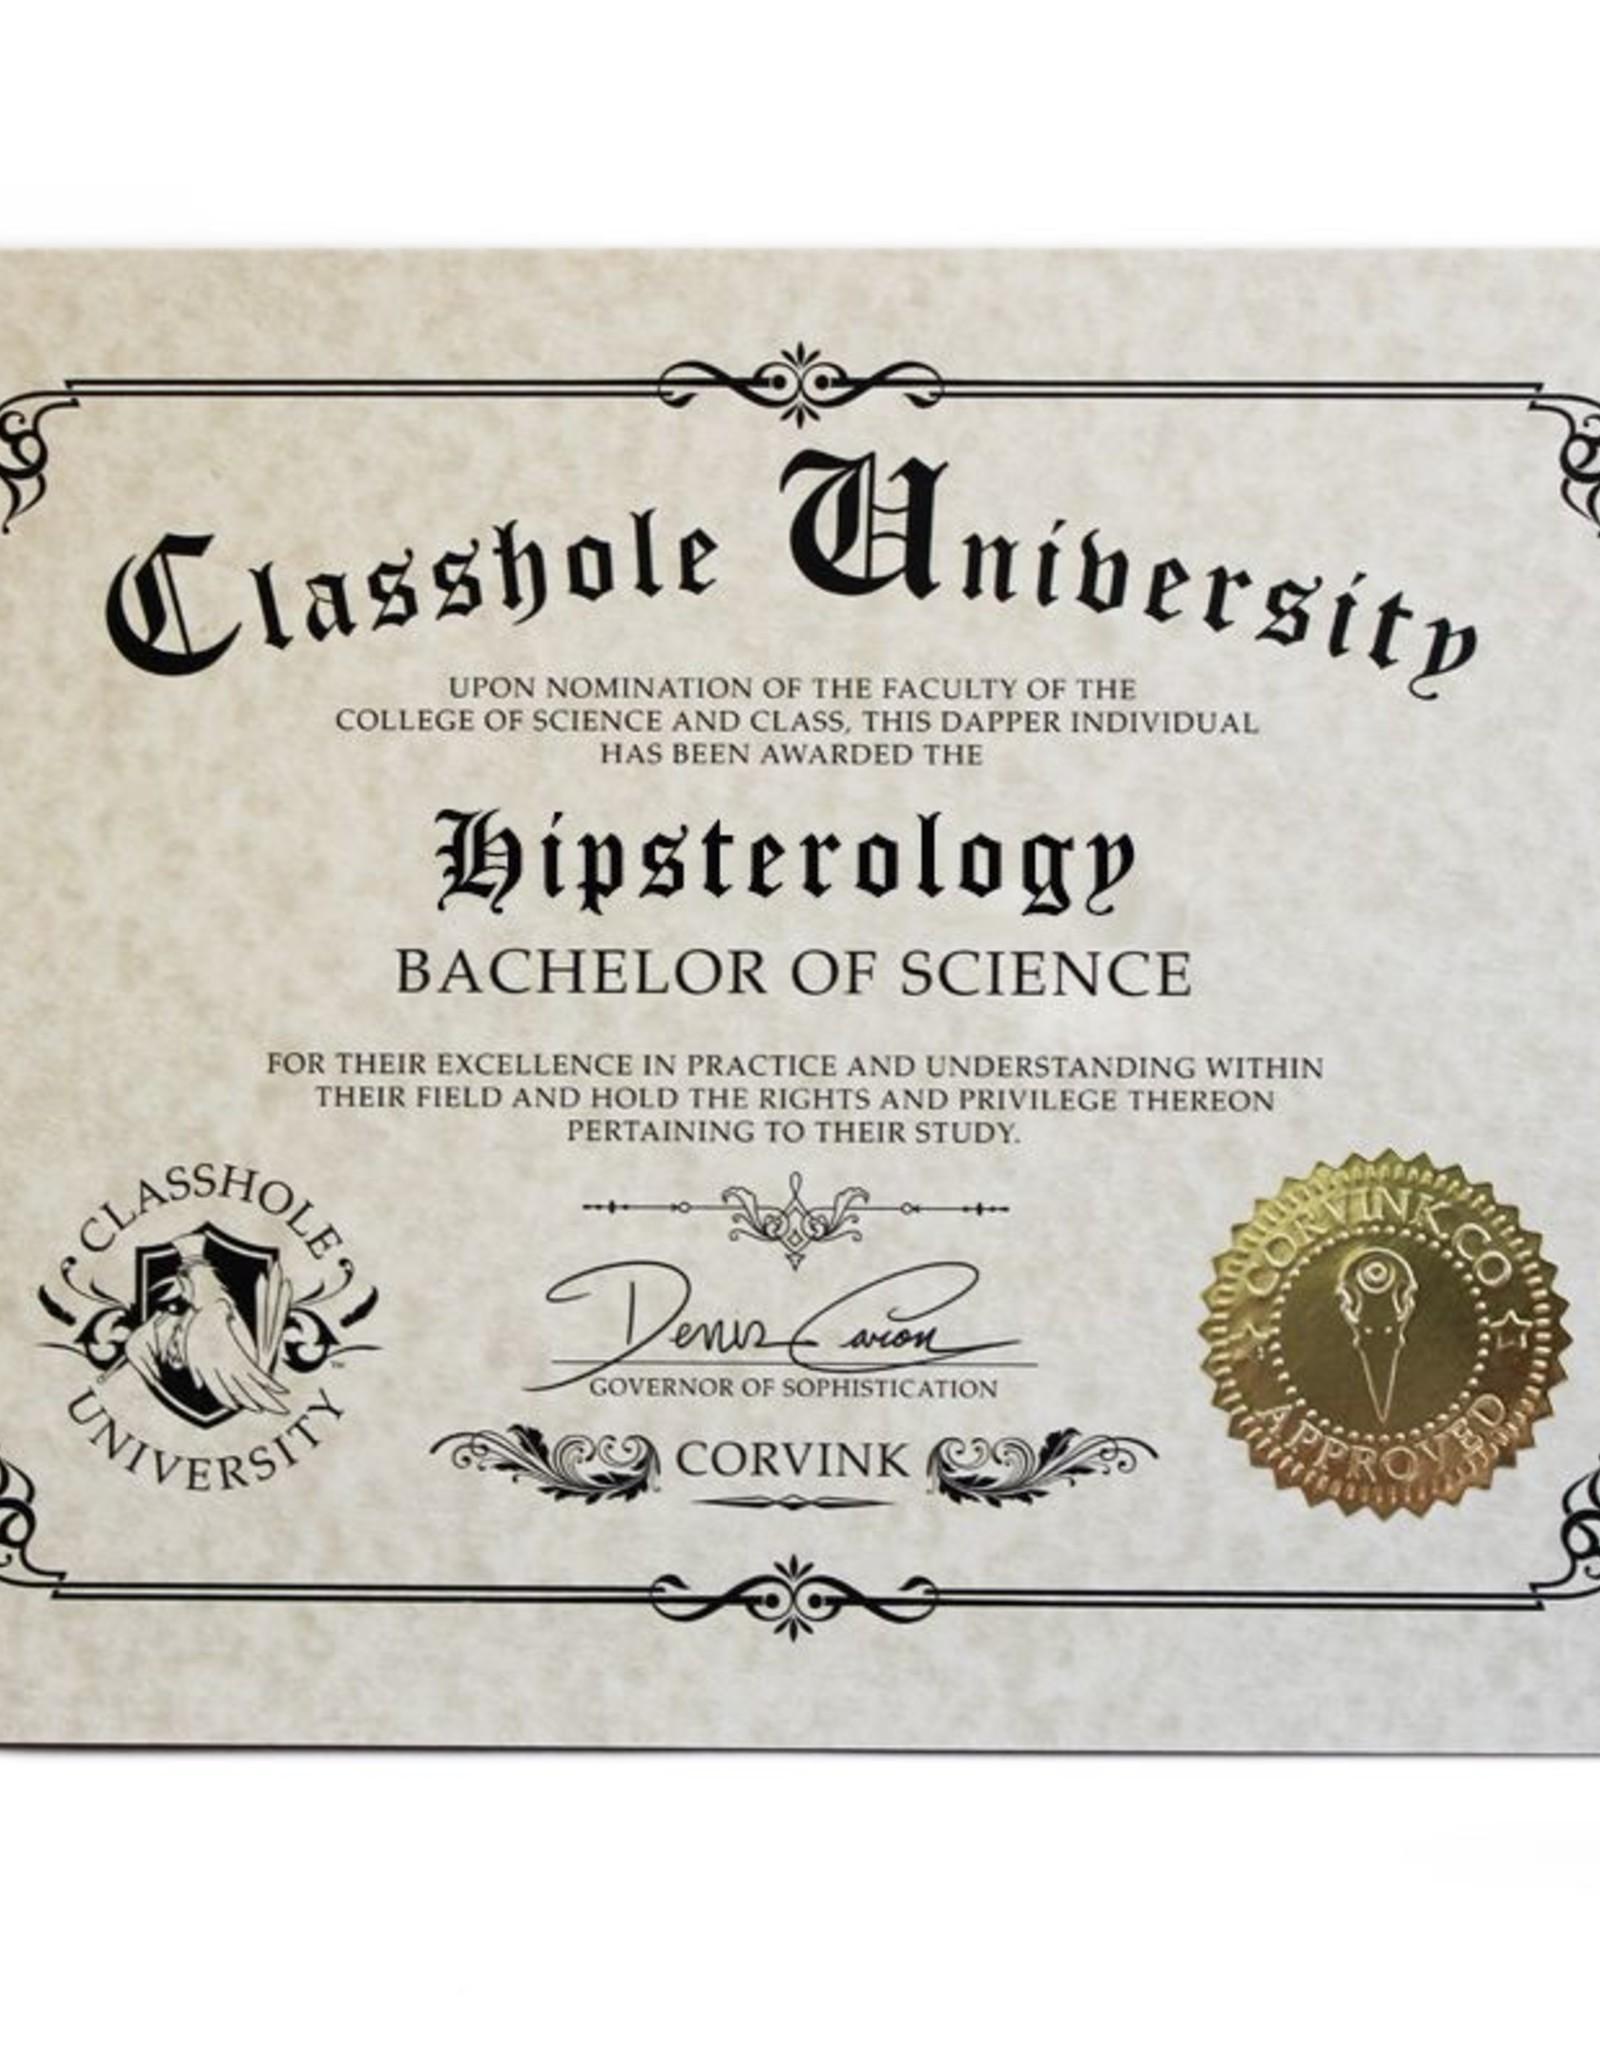 Classhole University BS Diplomas - Hipsterology